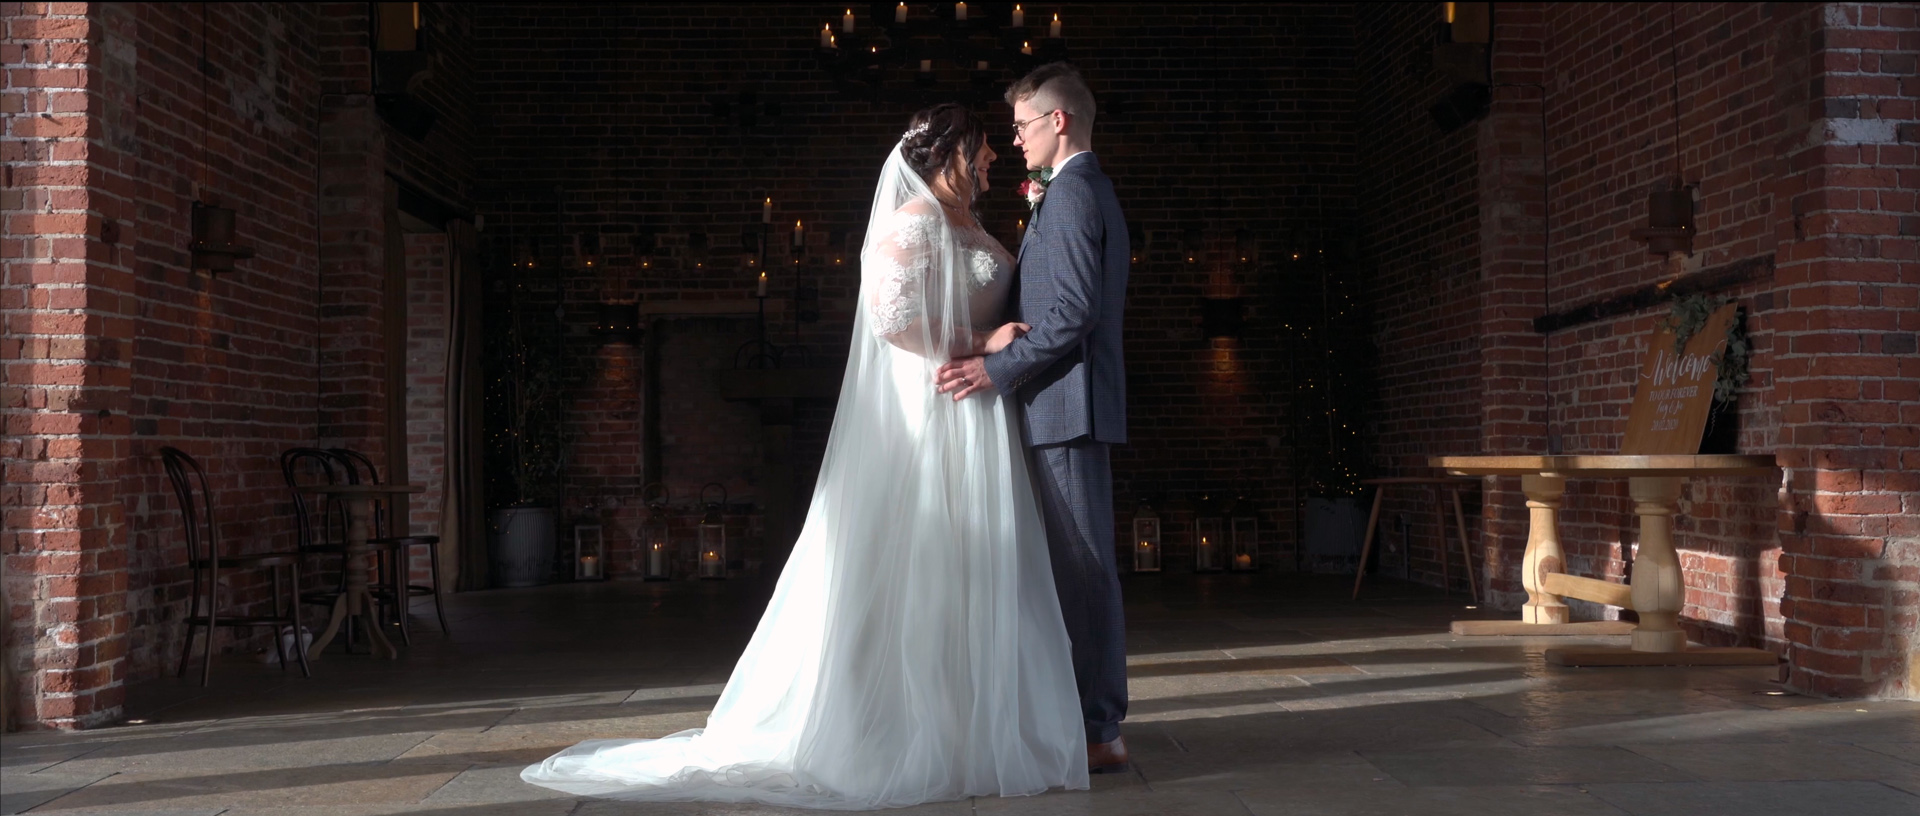 Matara Wedding Film